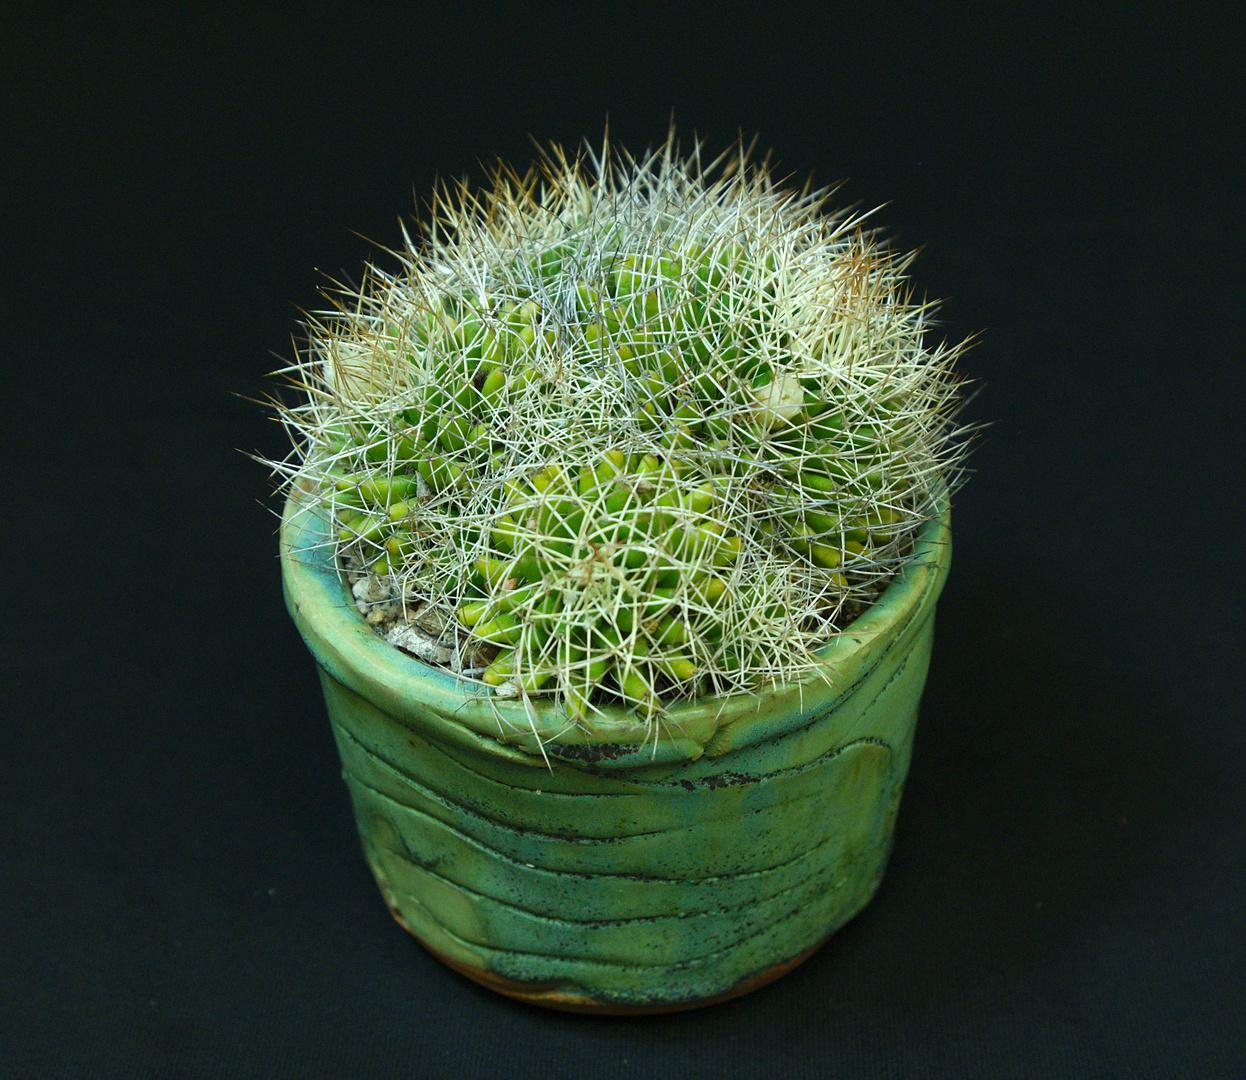 SCCSS 2017 May - Winner Novice Cactus - MA Bjarkman - Mammillaria decipiens